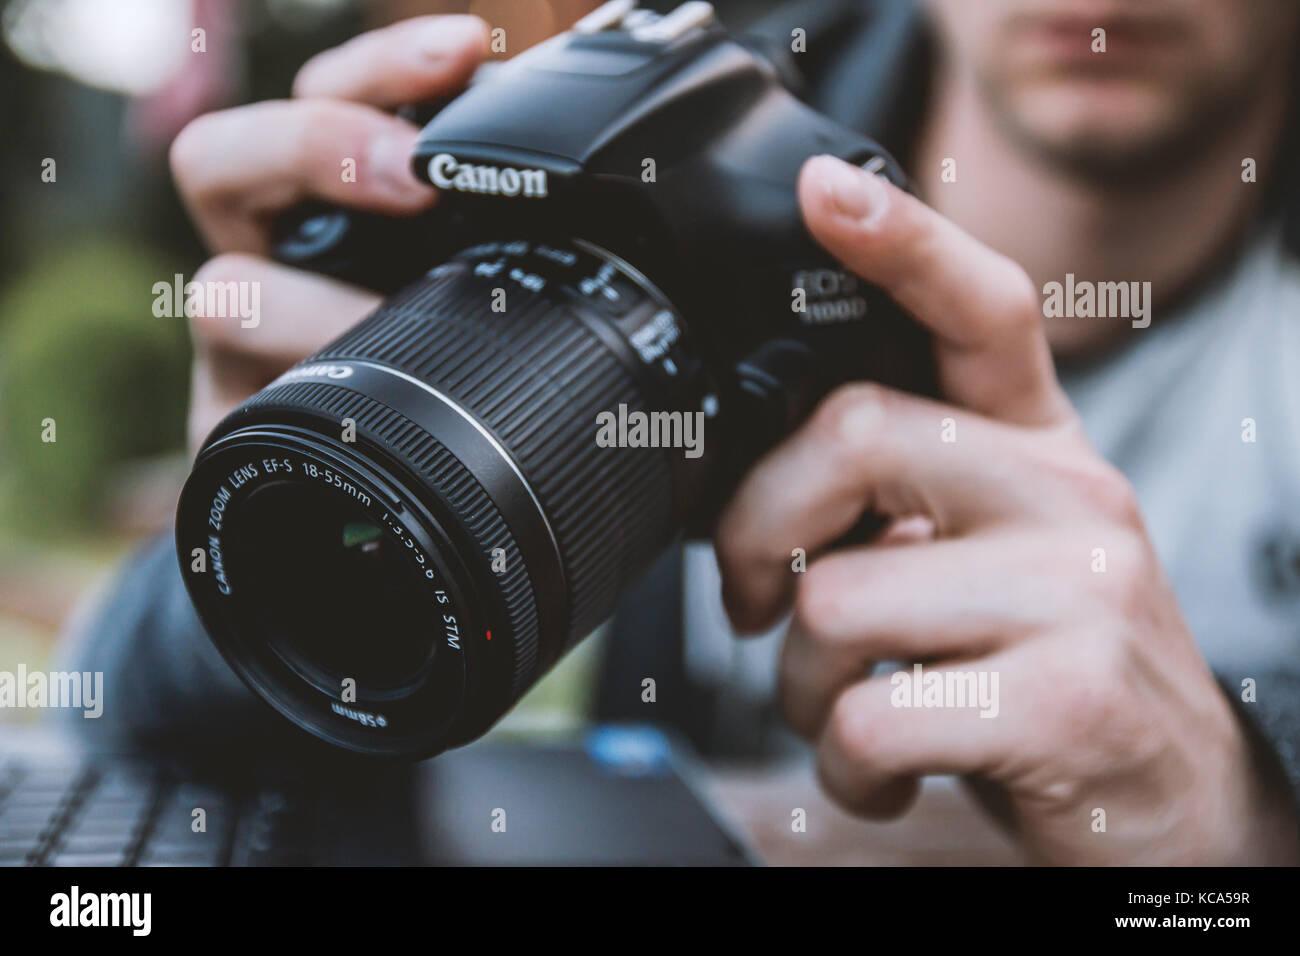 photography - Stock Image